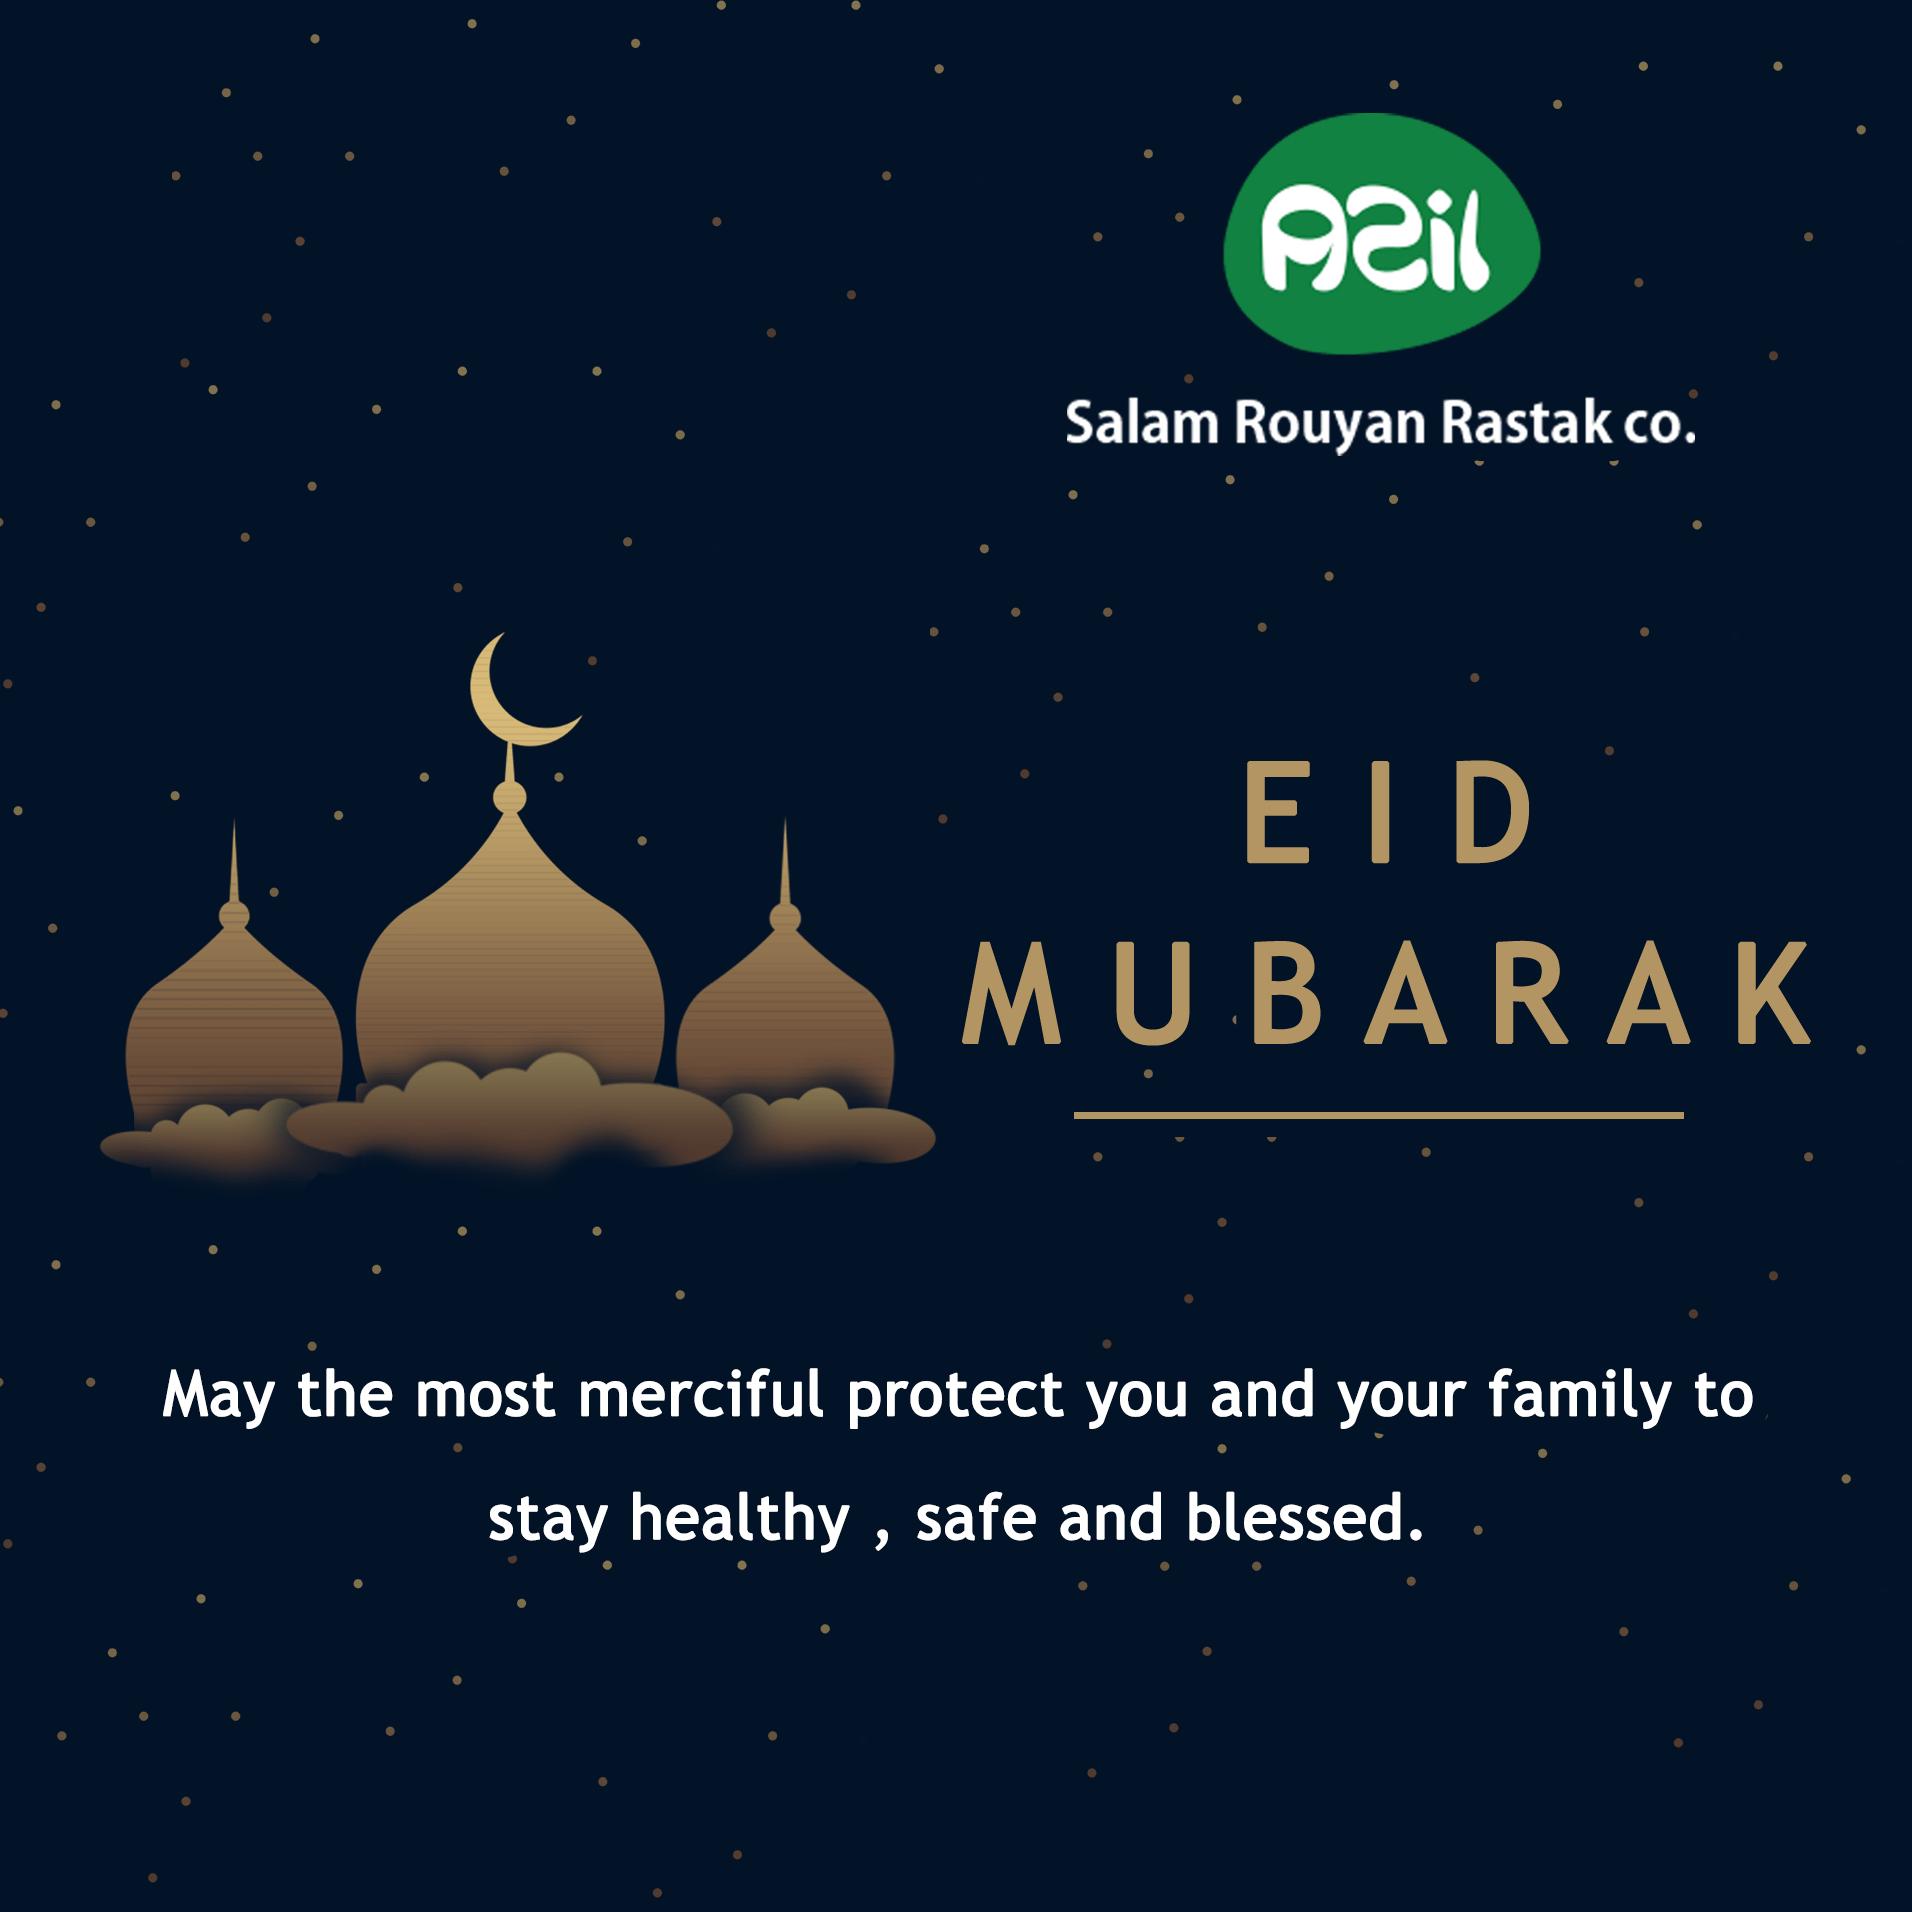 eid fetr - Eid al-Fitr Mubarak.